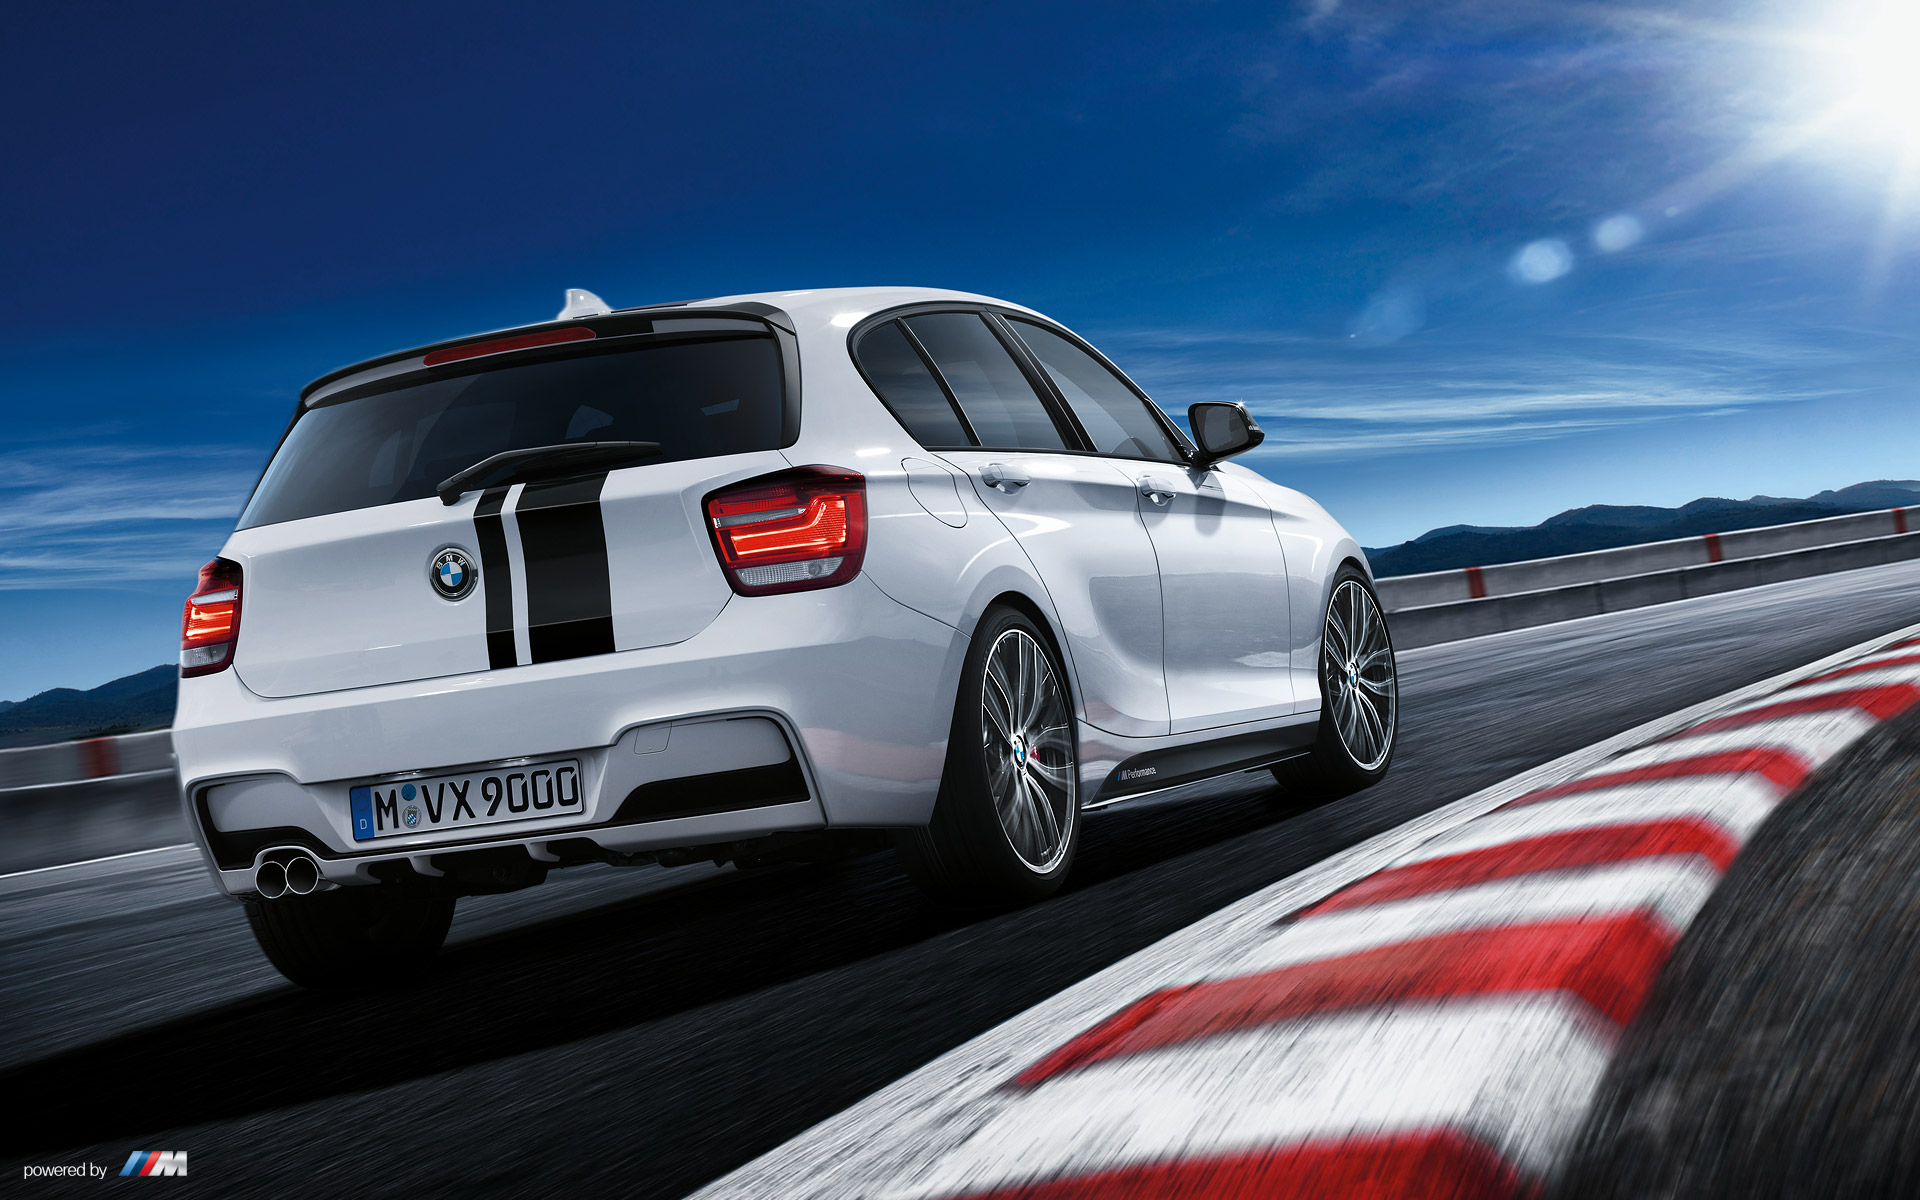 c689cfea40a2 Offers   services - Original BMW accessories - BMW M Performance Parts   Images   Videos